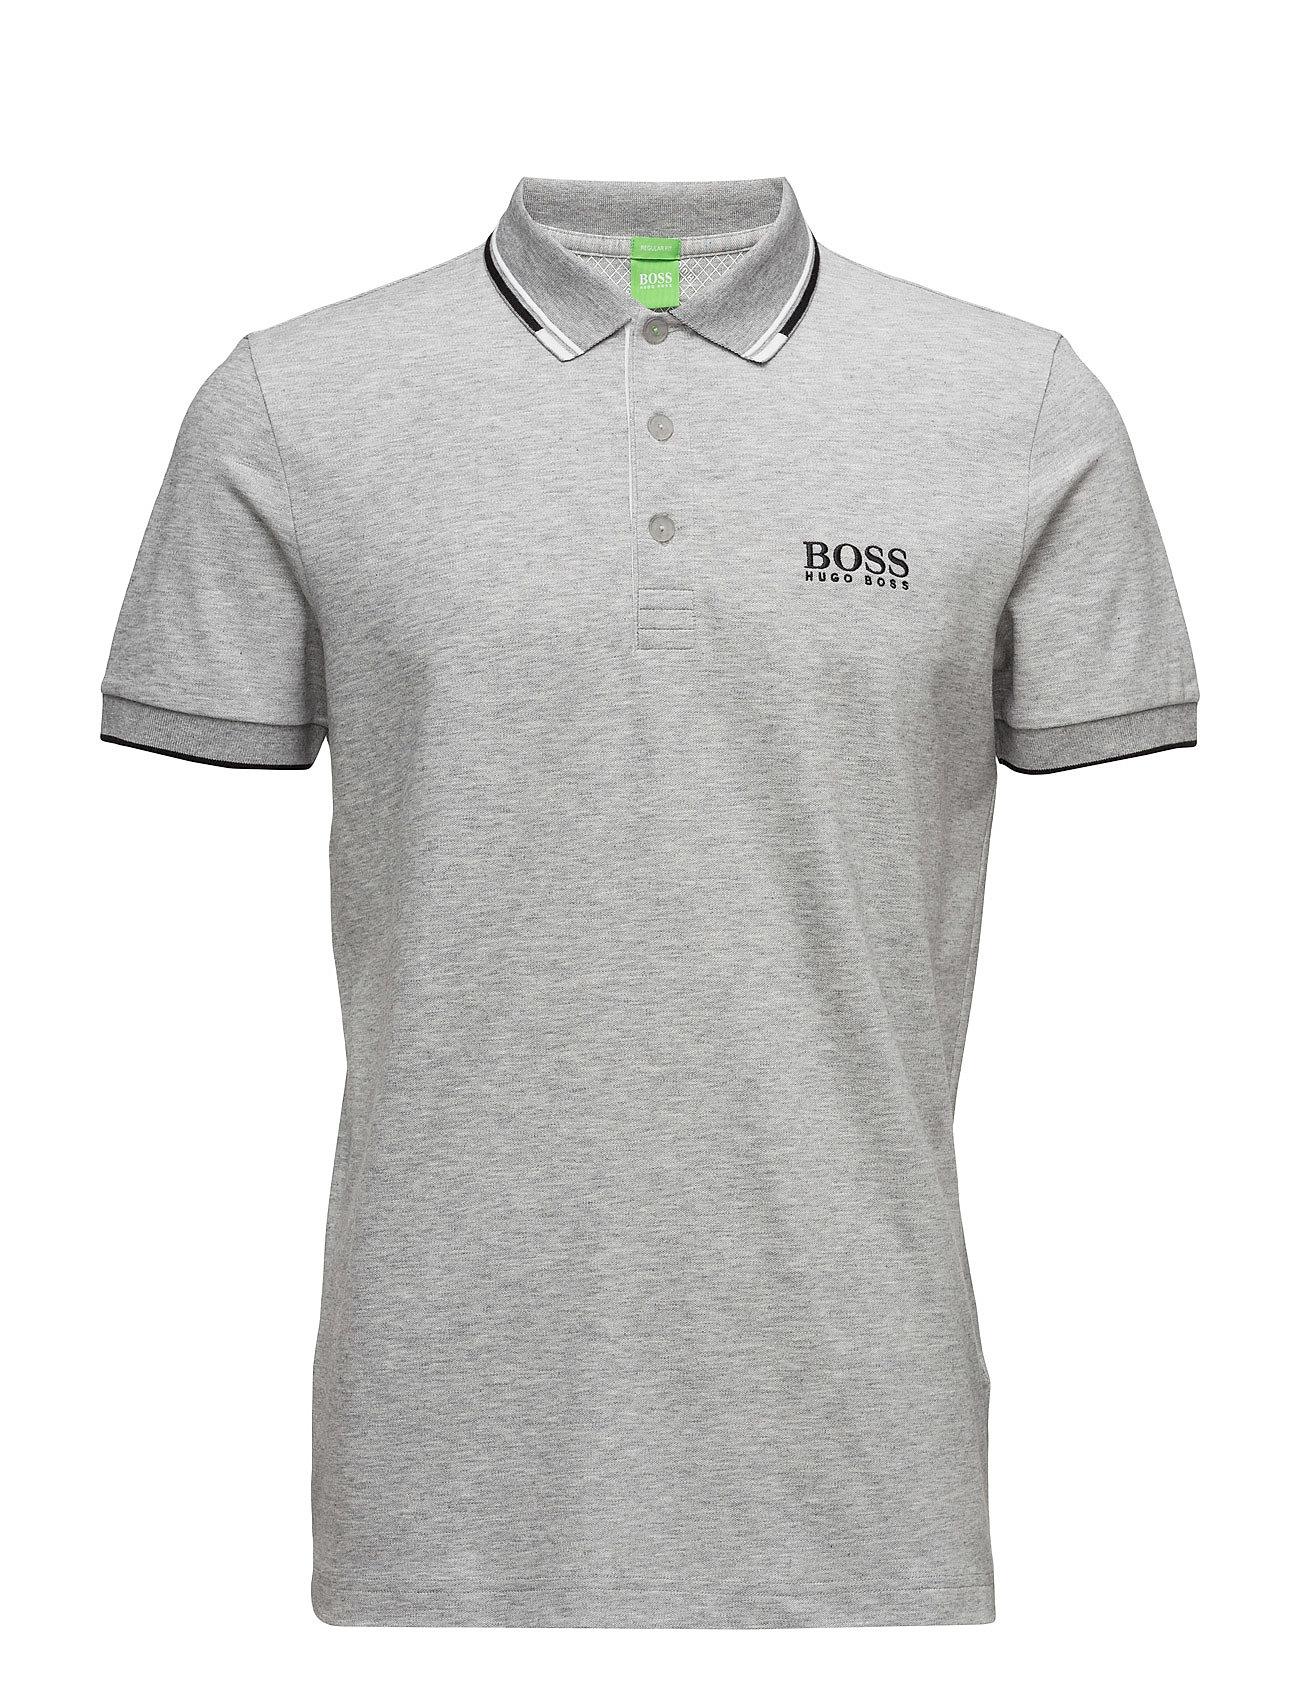 Paddy Pro BOSS GREEN Kortærmede polo t-shirts til Herrer i Open Grey